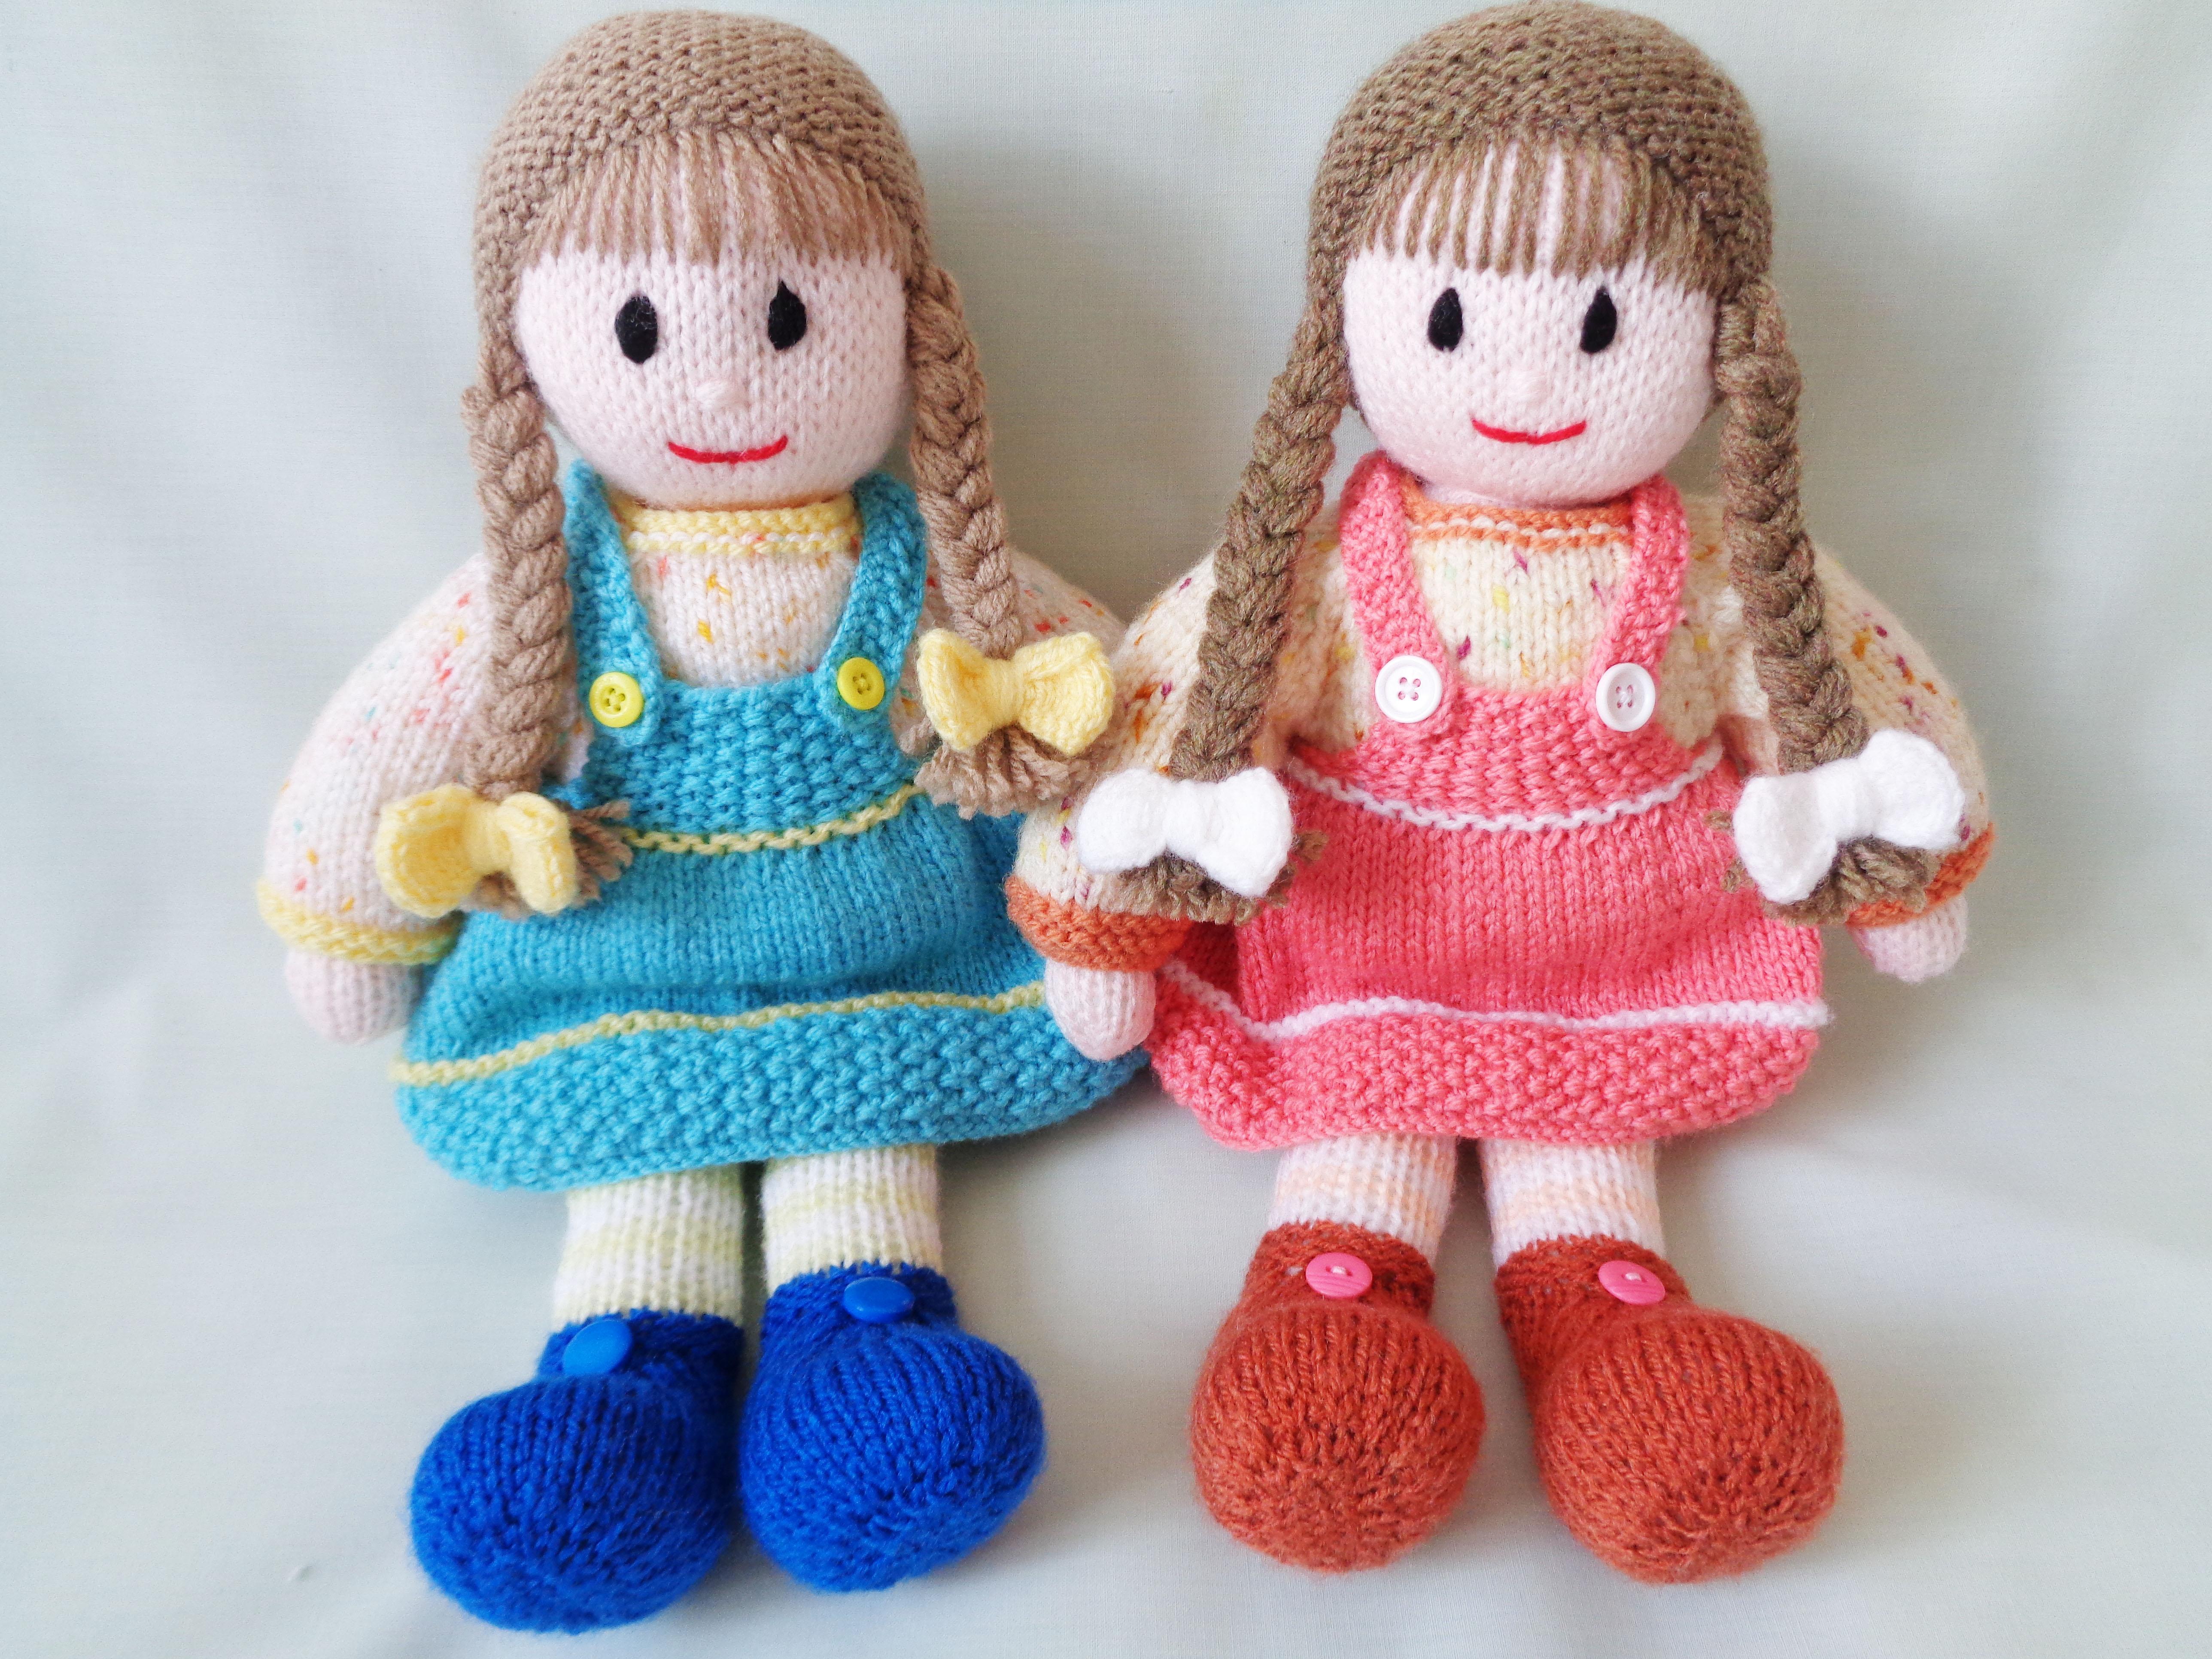 Knitted Doll | Carol Turner